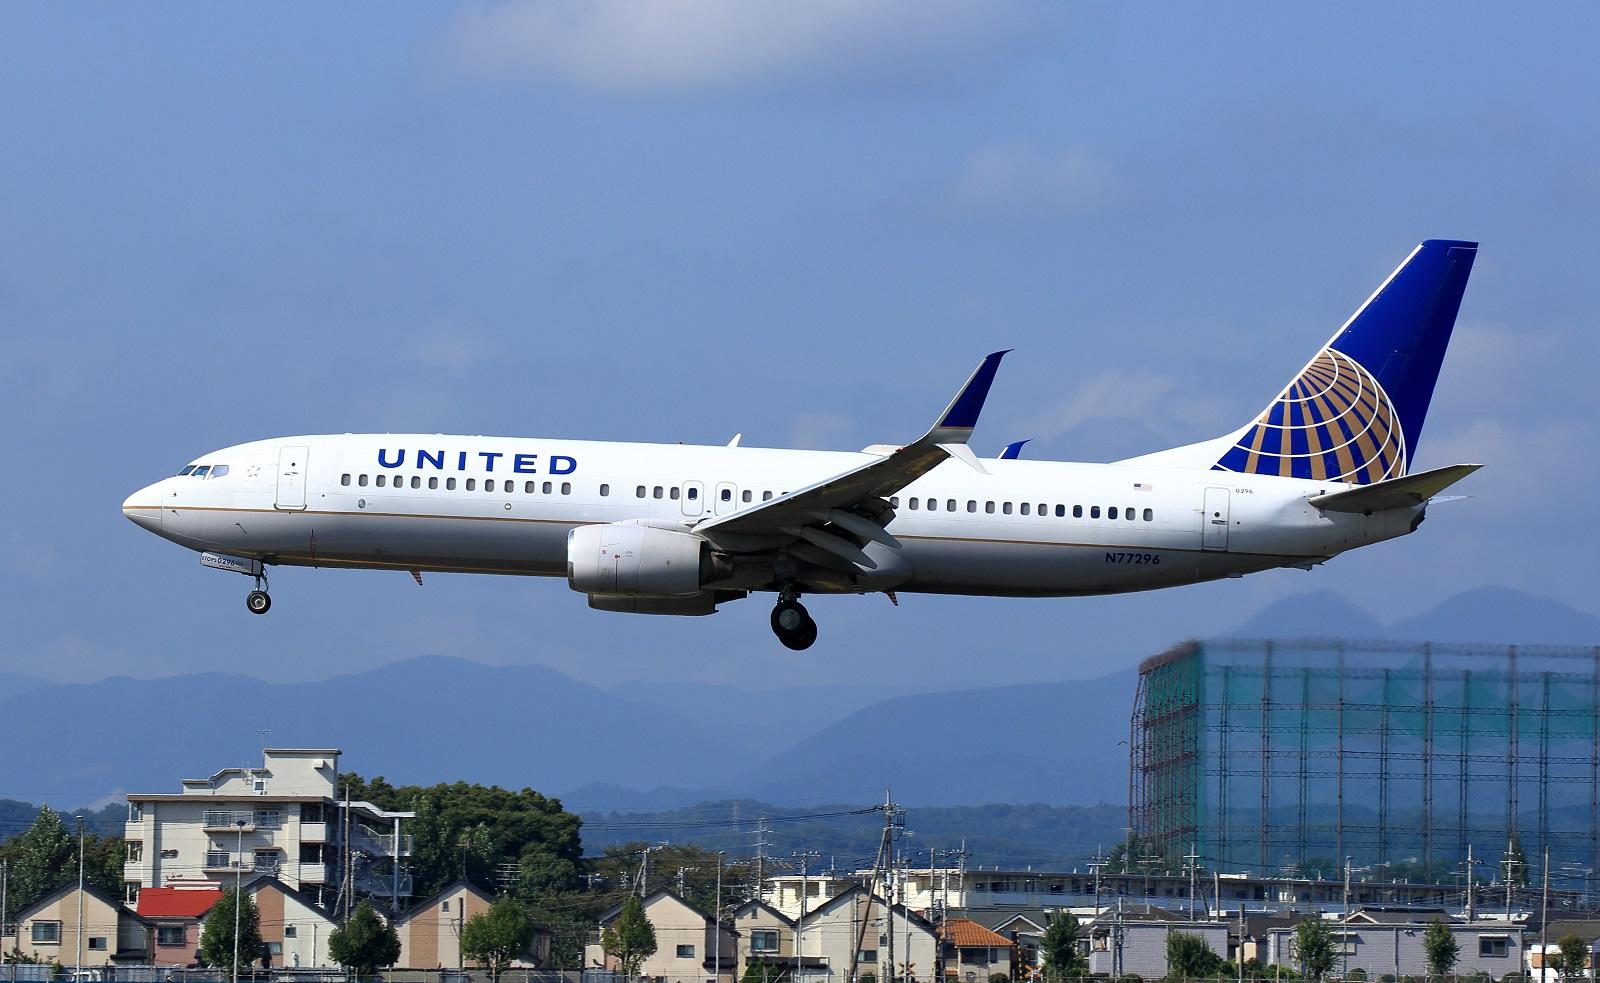 United171009tk976